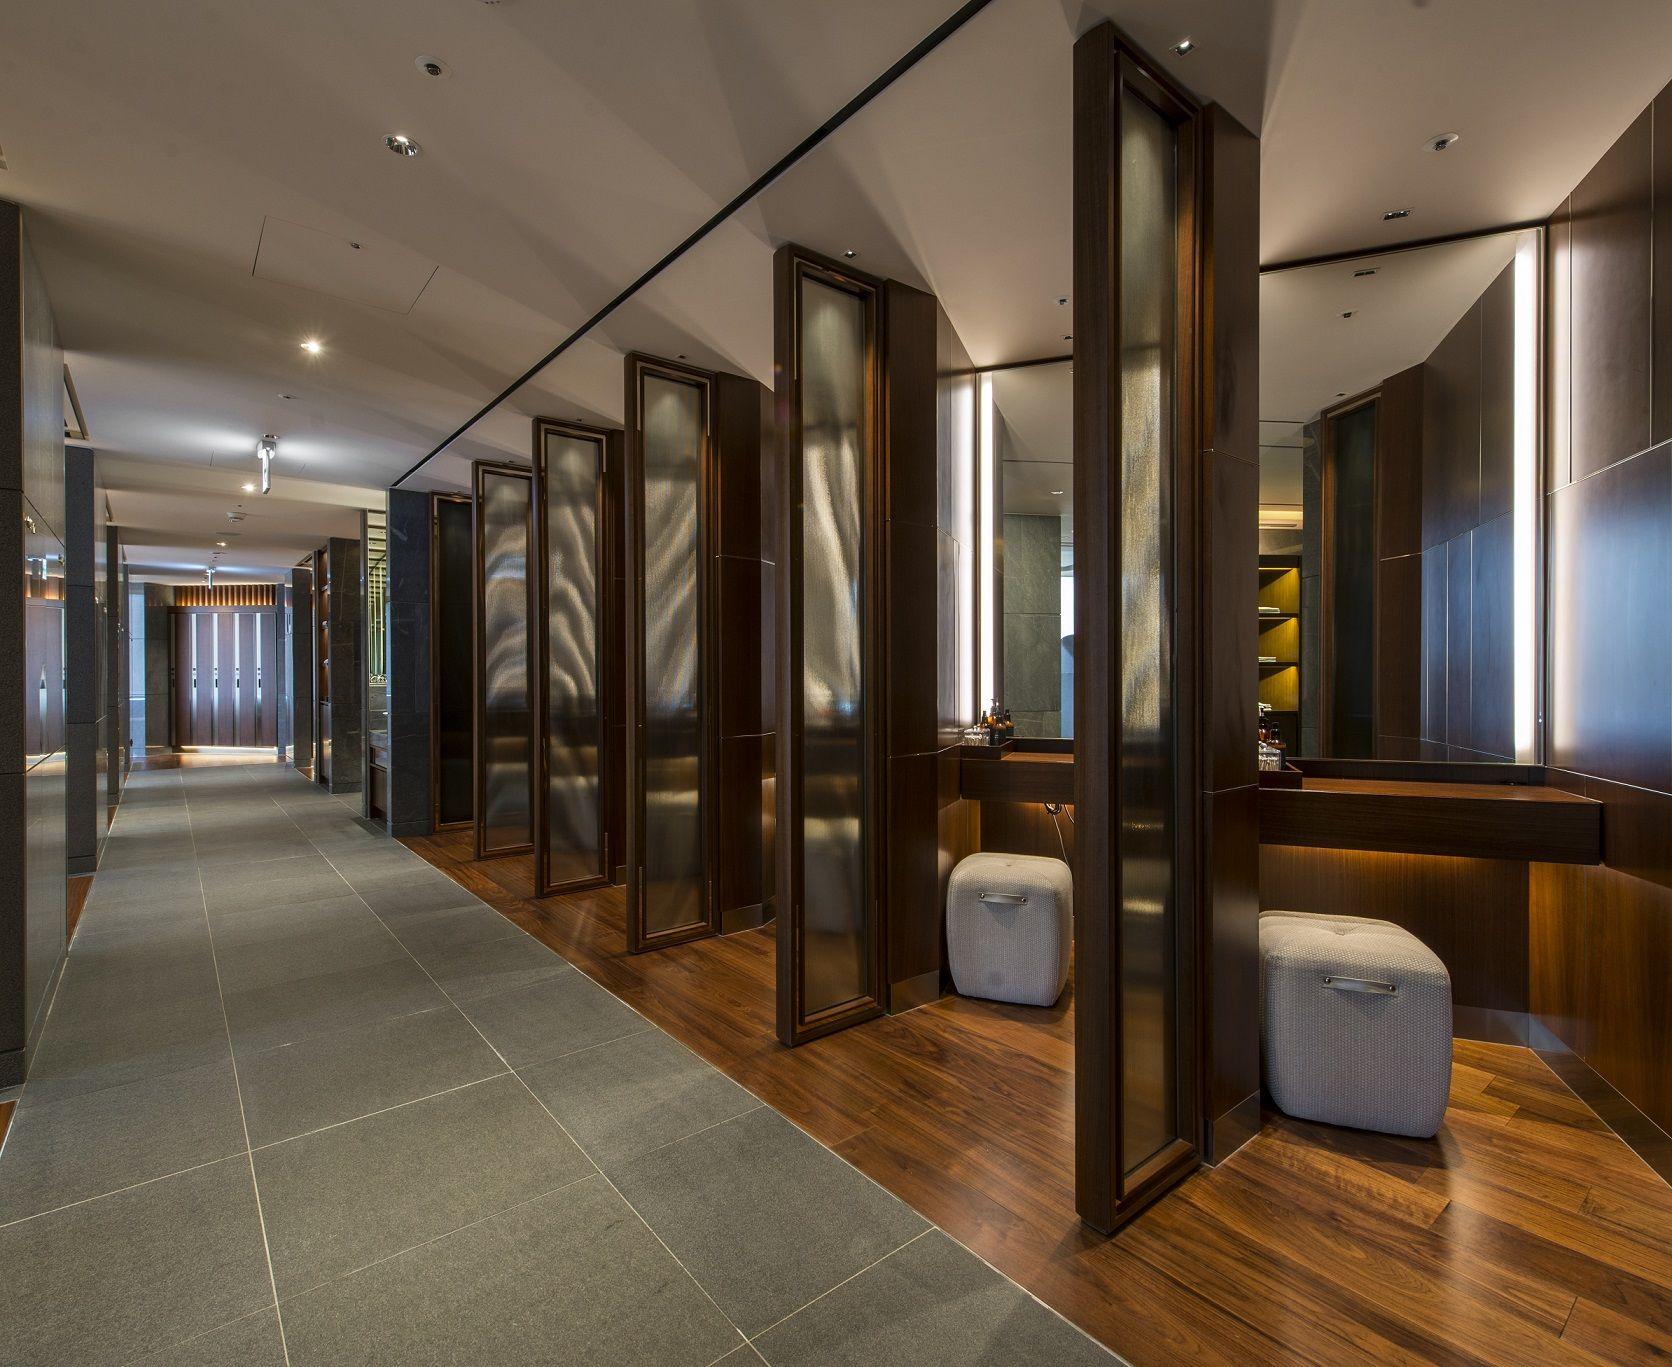 Signiel hotel lotte world tower u seoul south korea